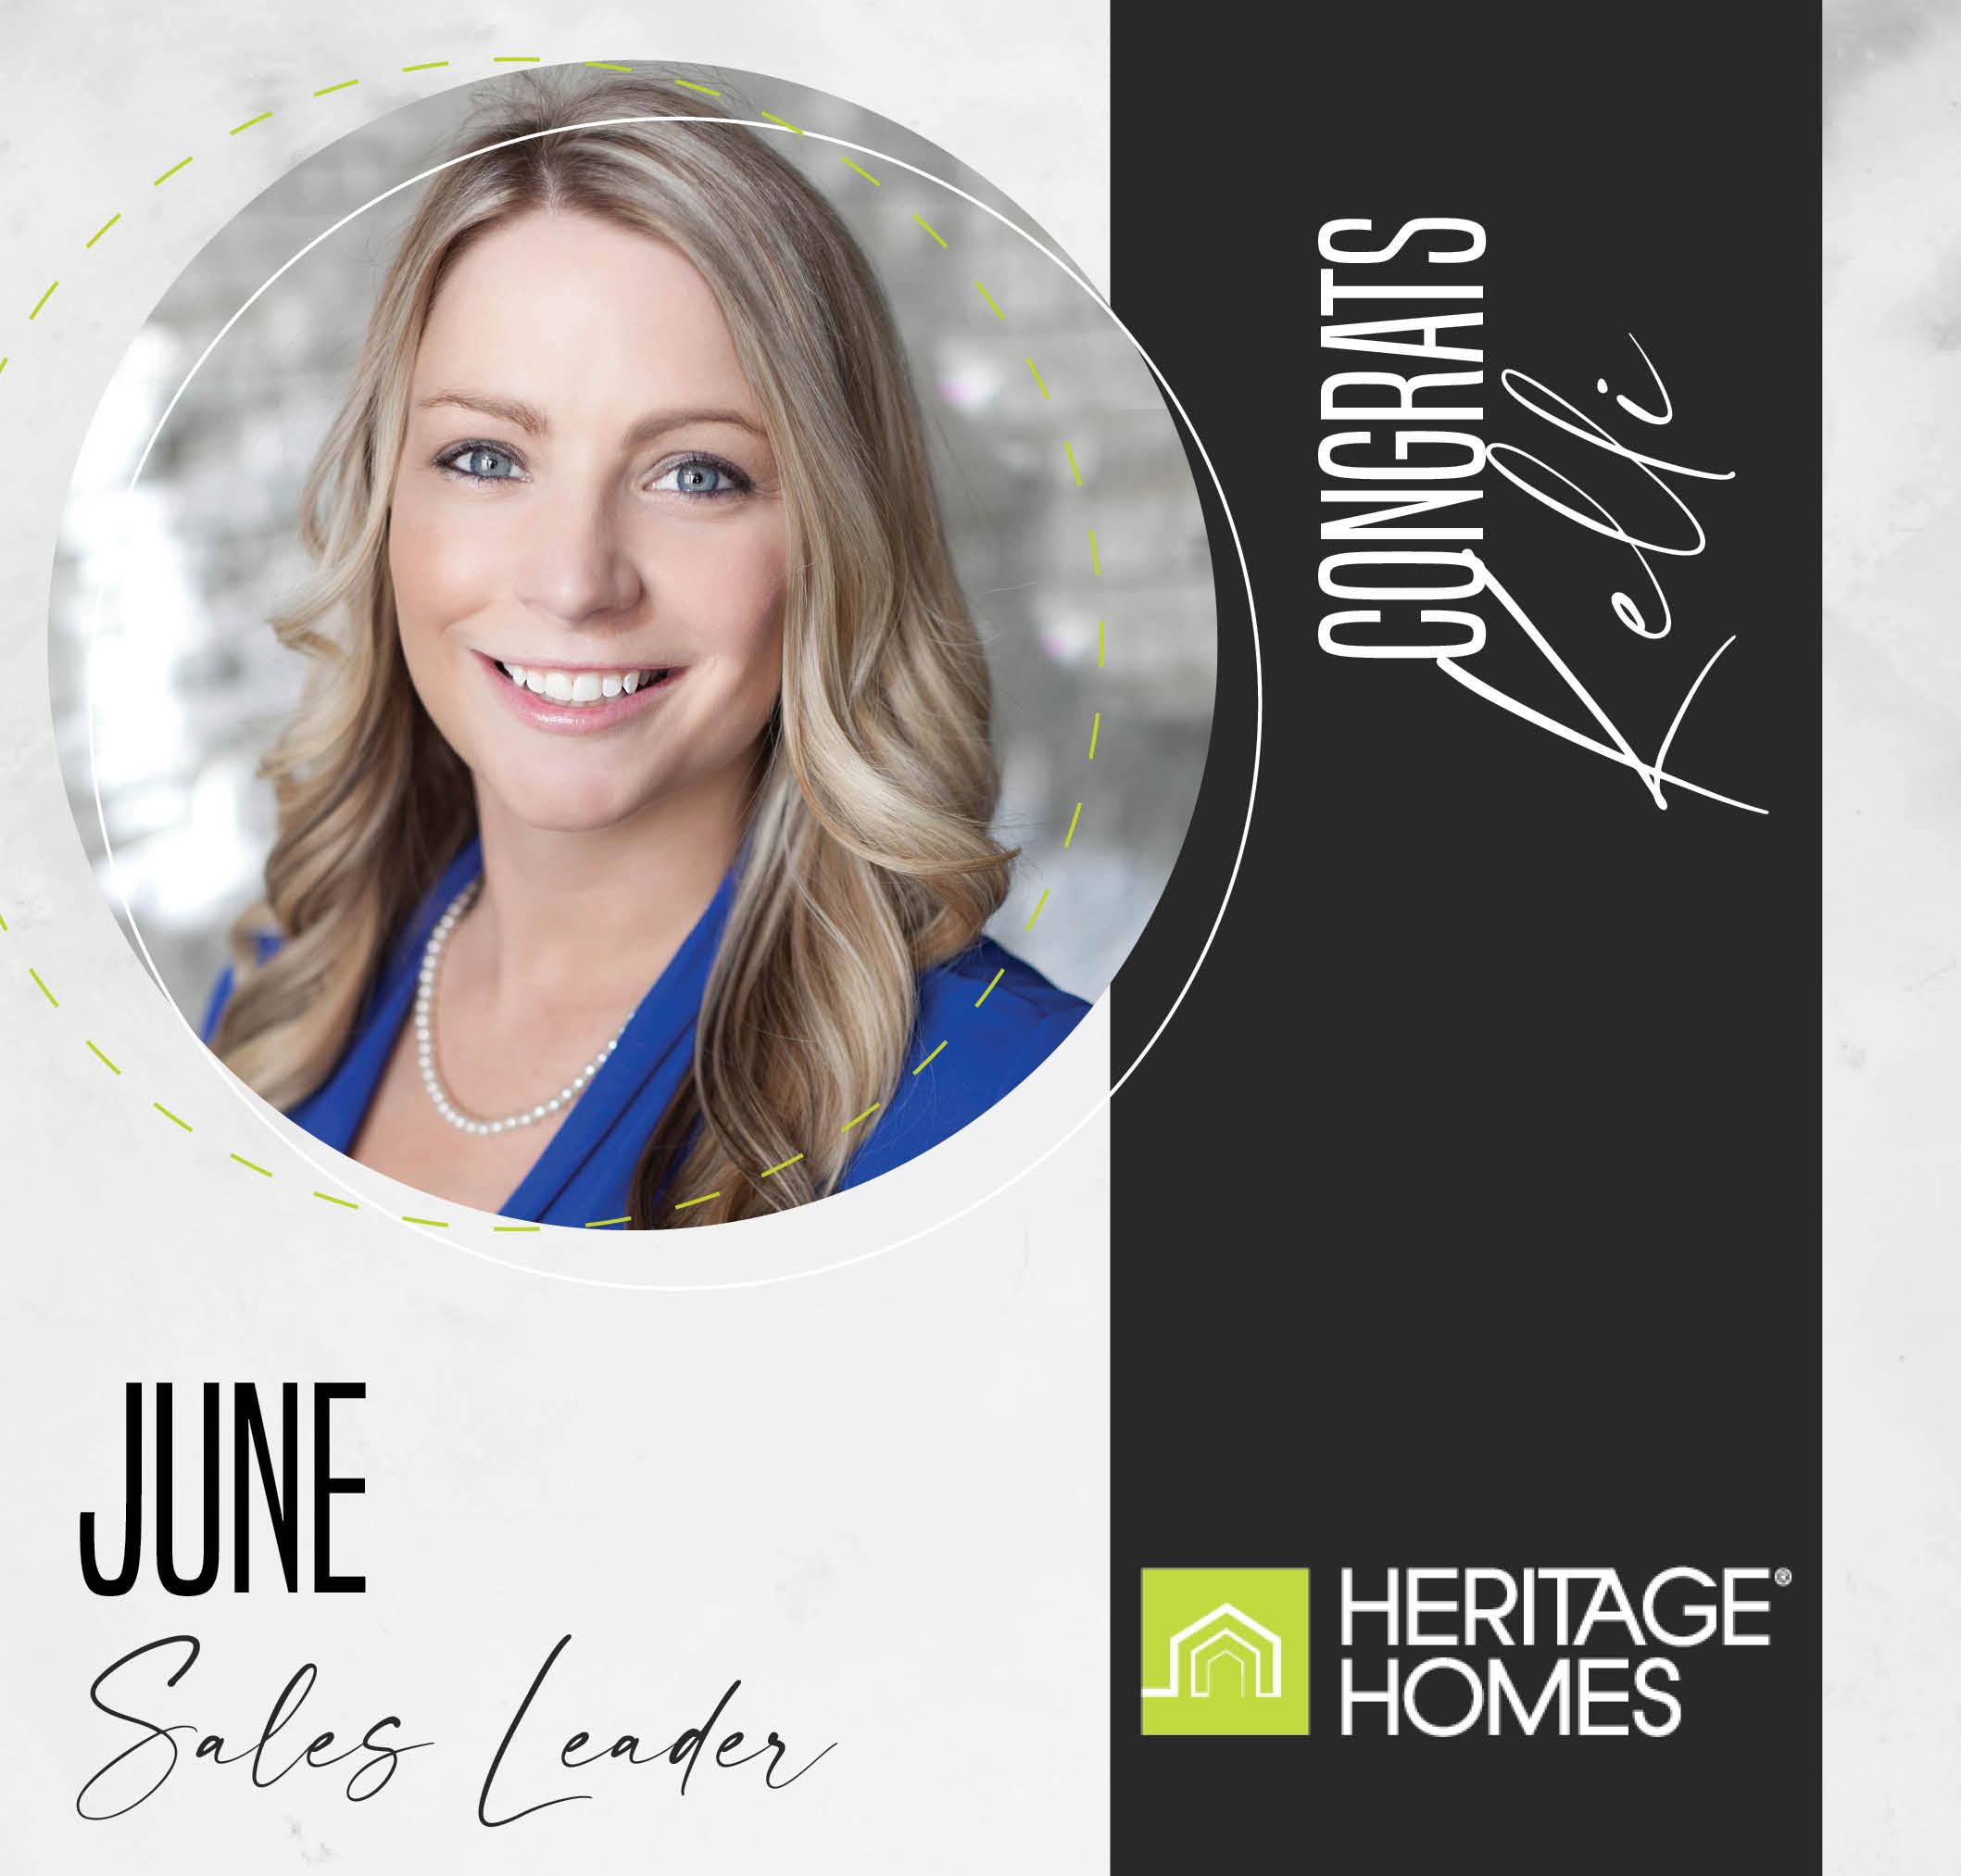 June Sales Leader – Kelli Sessler